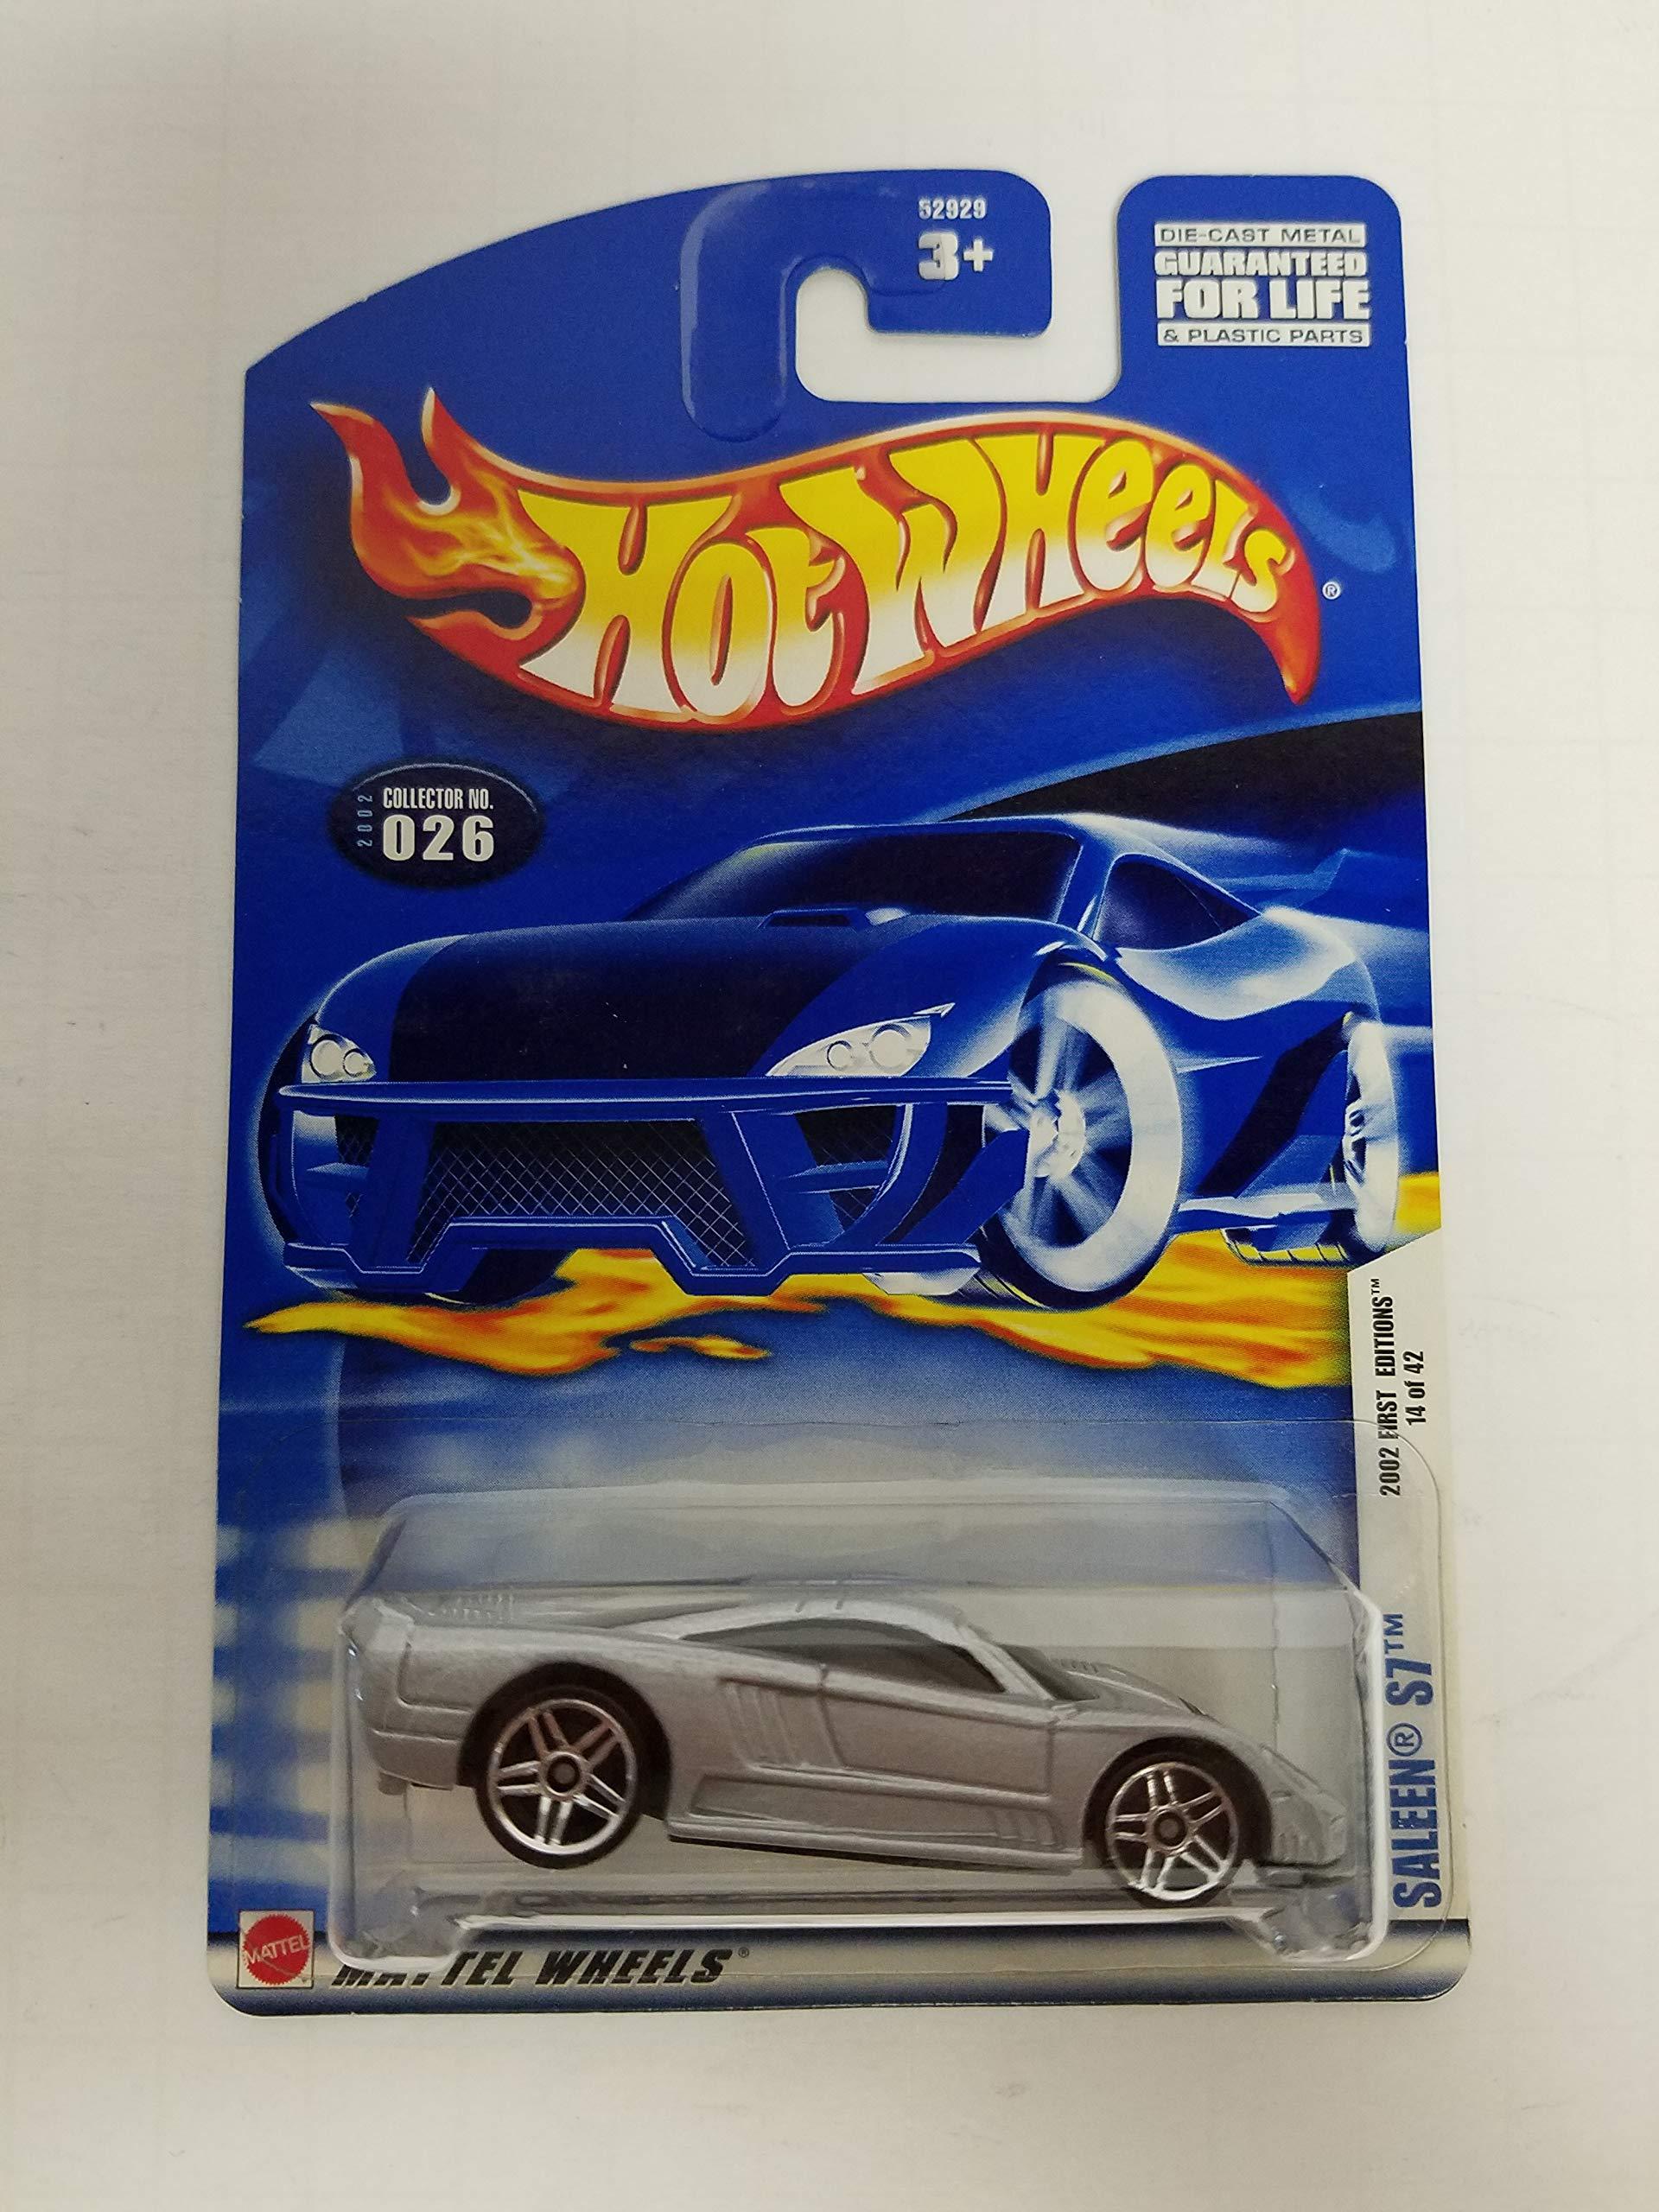 Saleen S7 Hot Wheels 2002 diecast 1/64 scale car No. 026